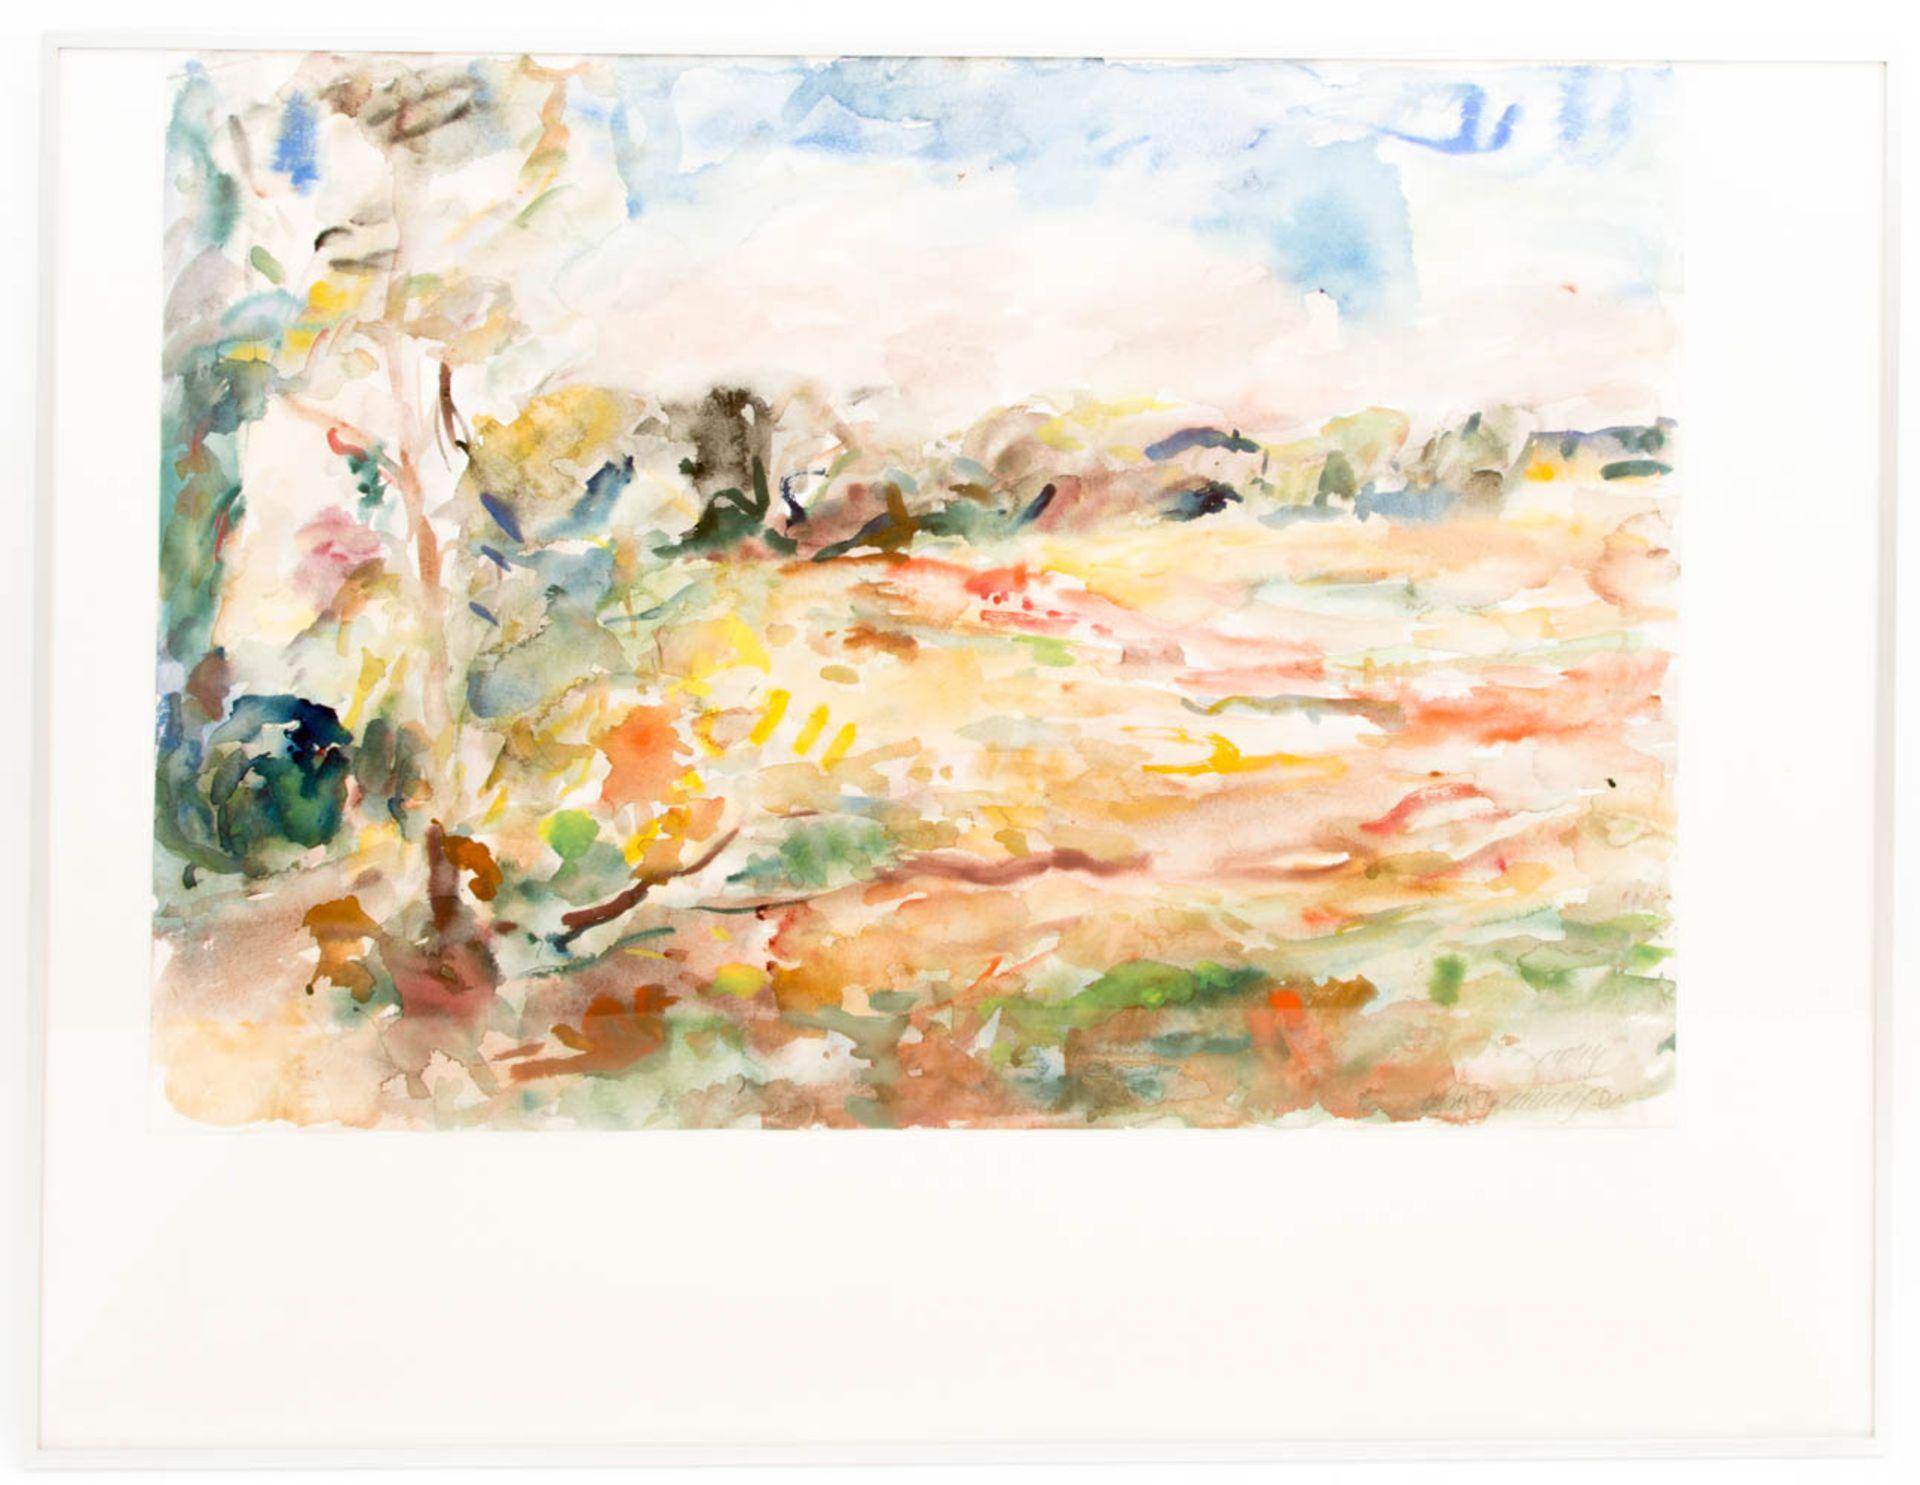 Manfred Henninger, Landschaftsansicht, Aquarell, 1944.